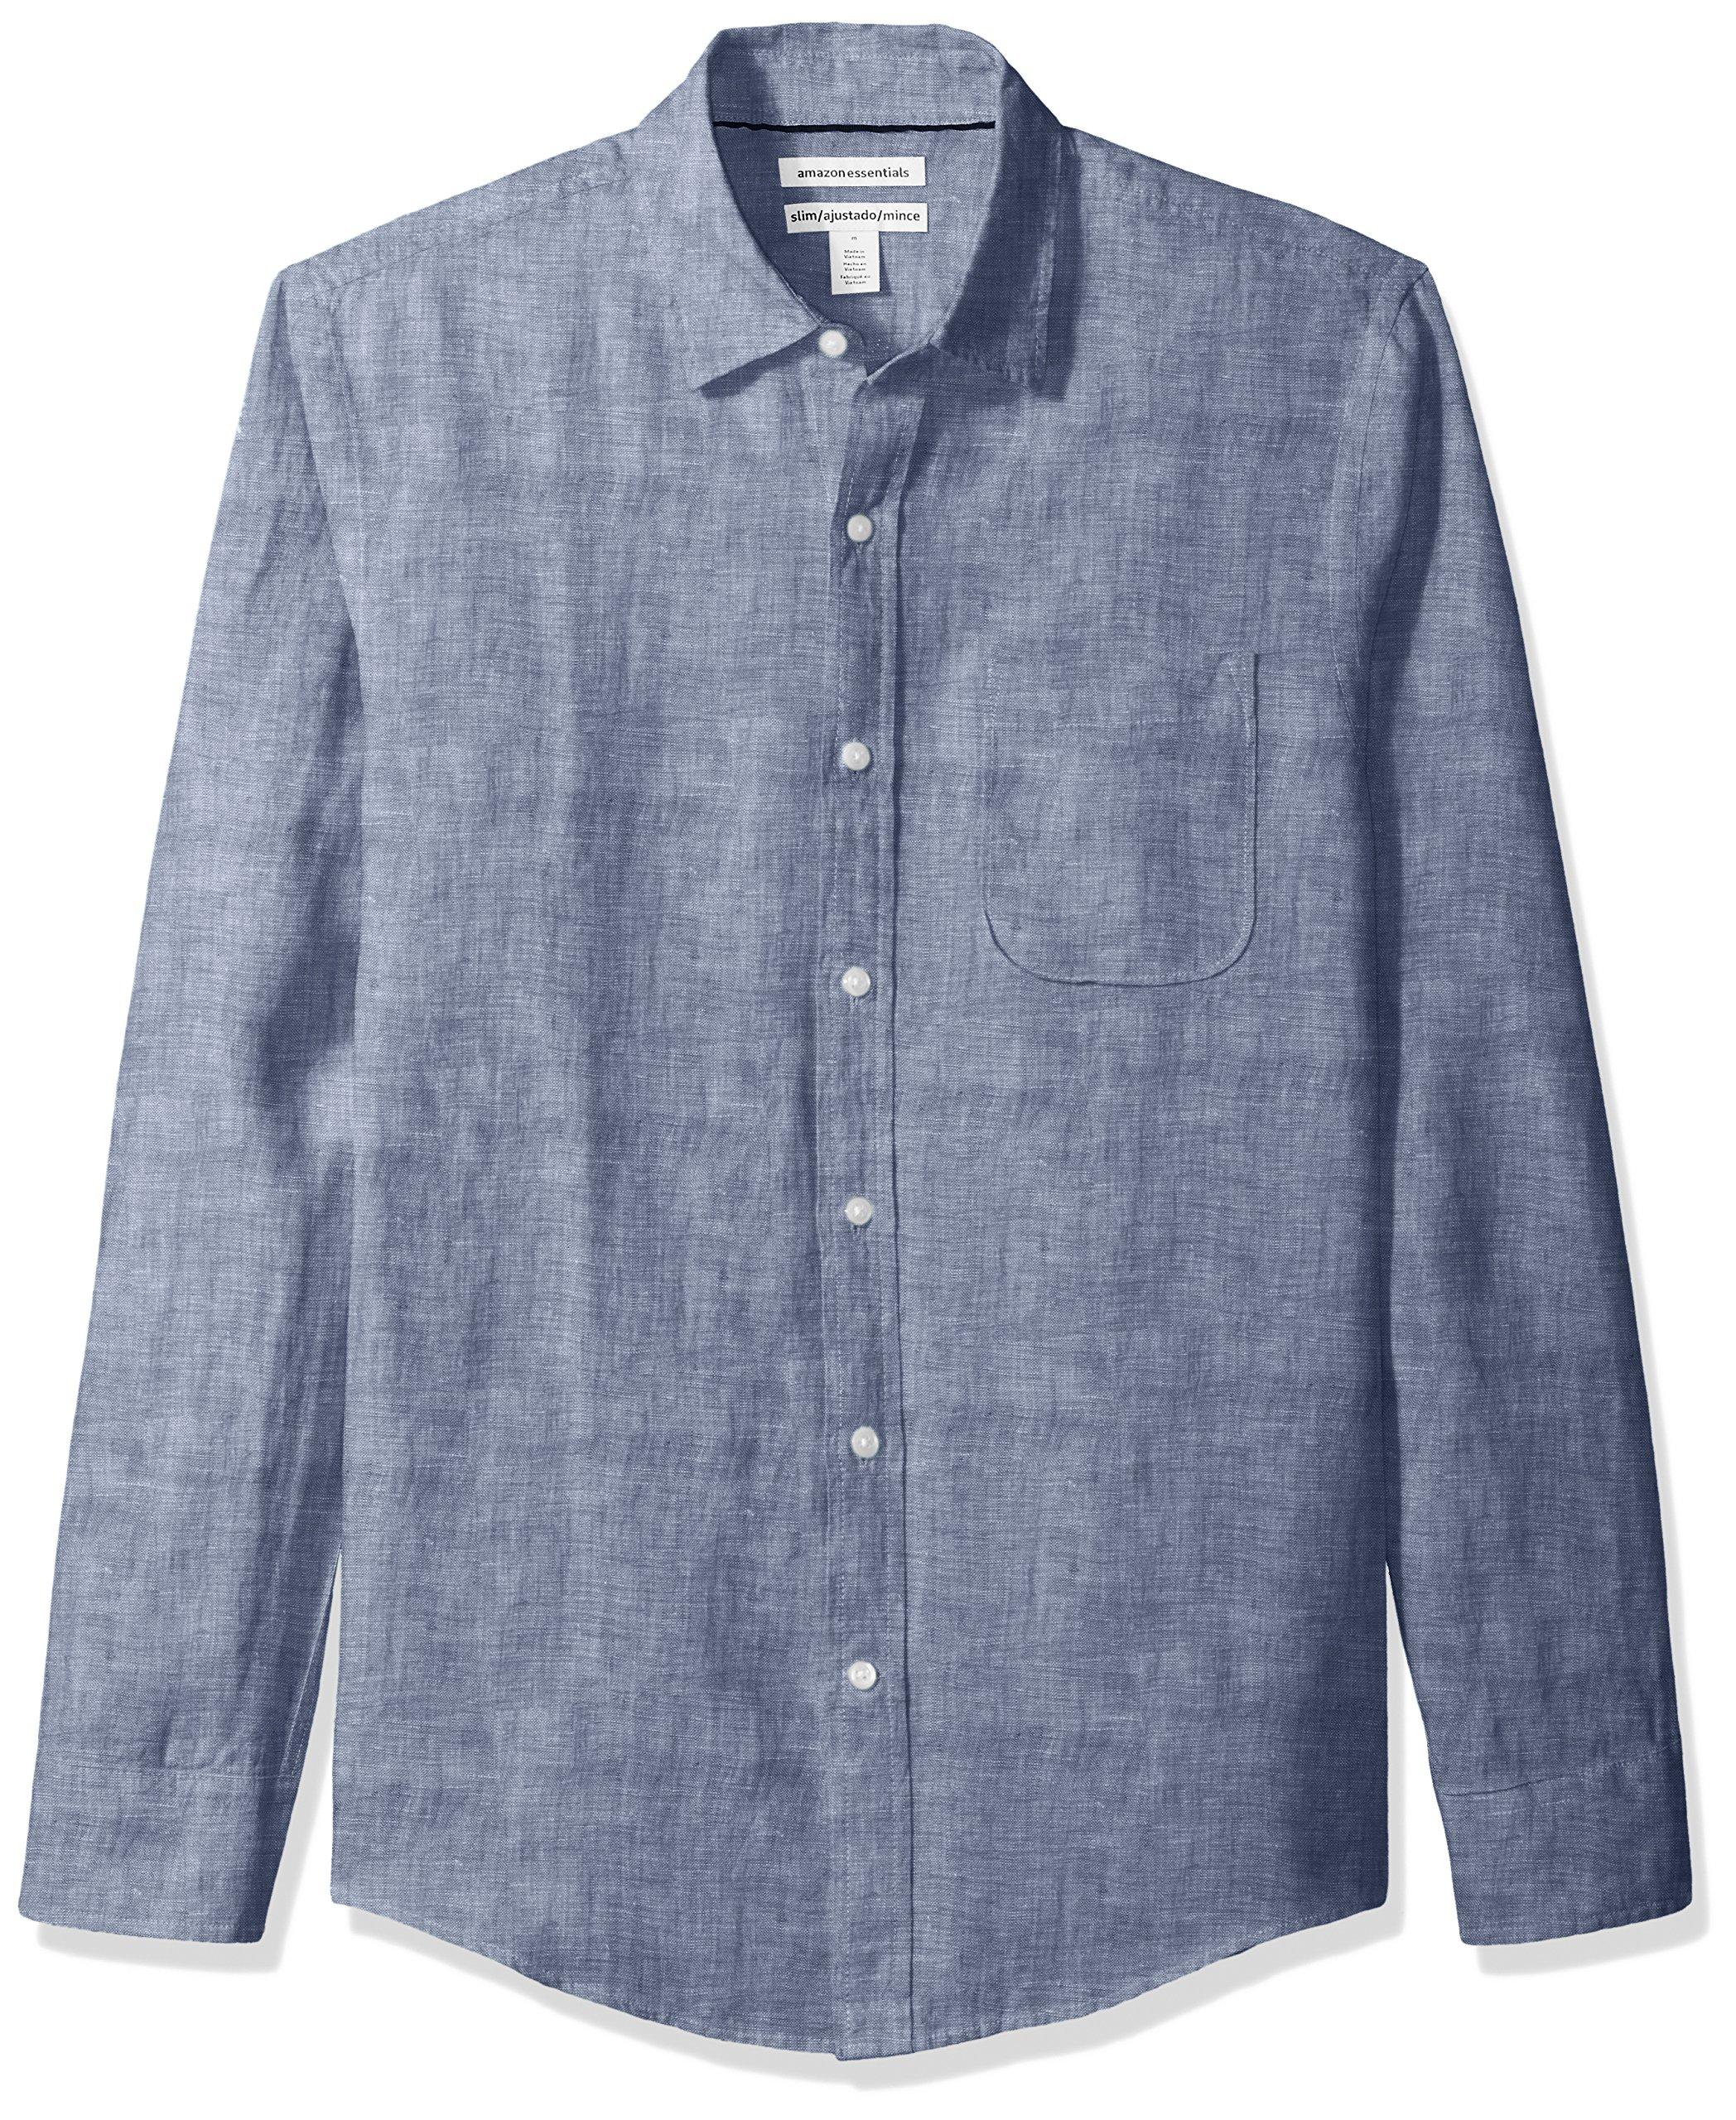 Amazon Essentials Men's Slim-Fit Long-Sleeve Linen Shirt, Navy, Large